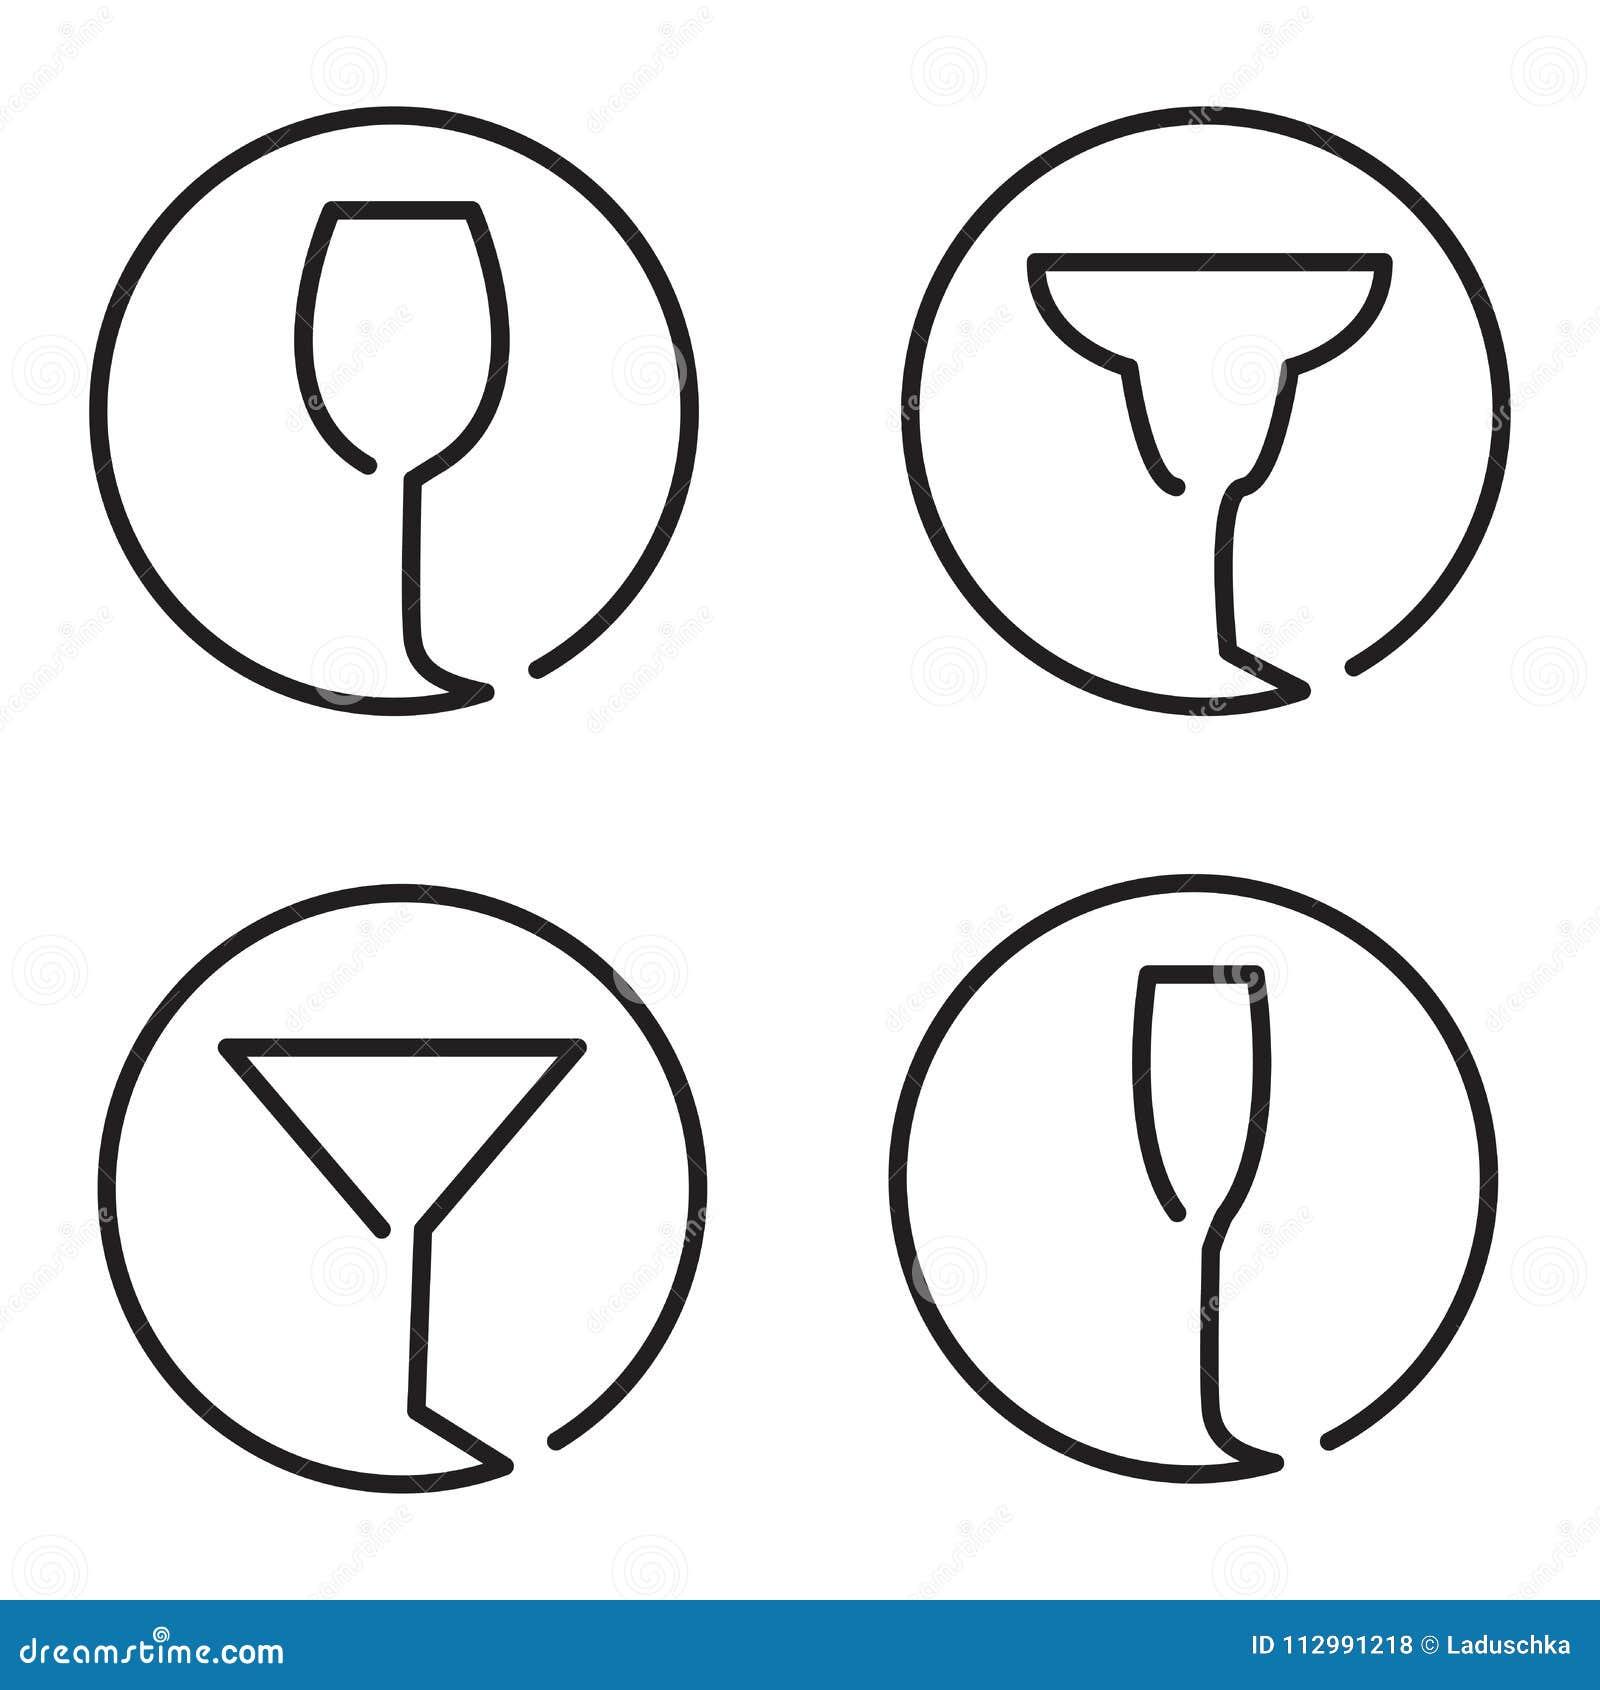 Continuous line art logo set of different glasses, wine, margarita cocktail, martini, champaign